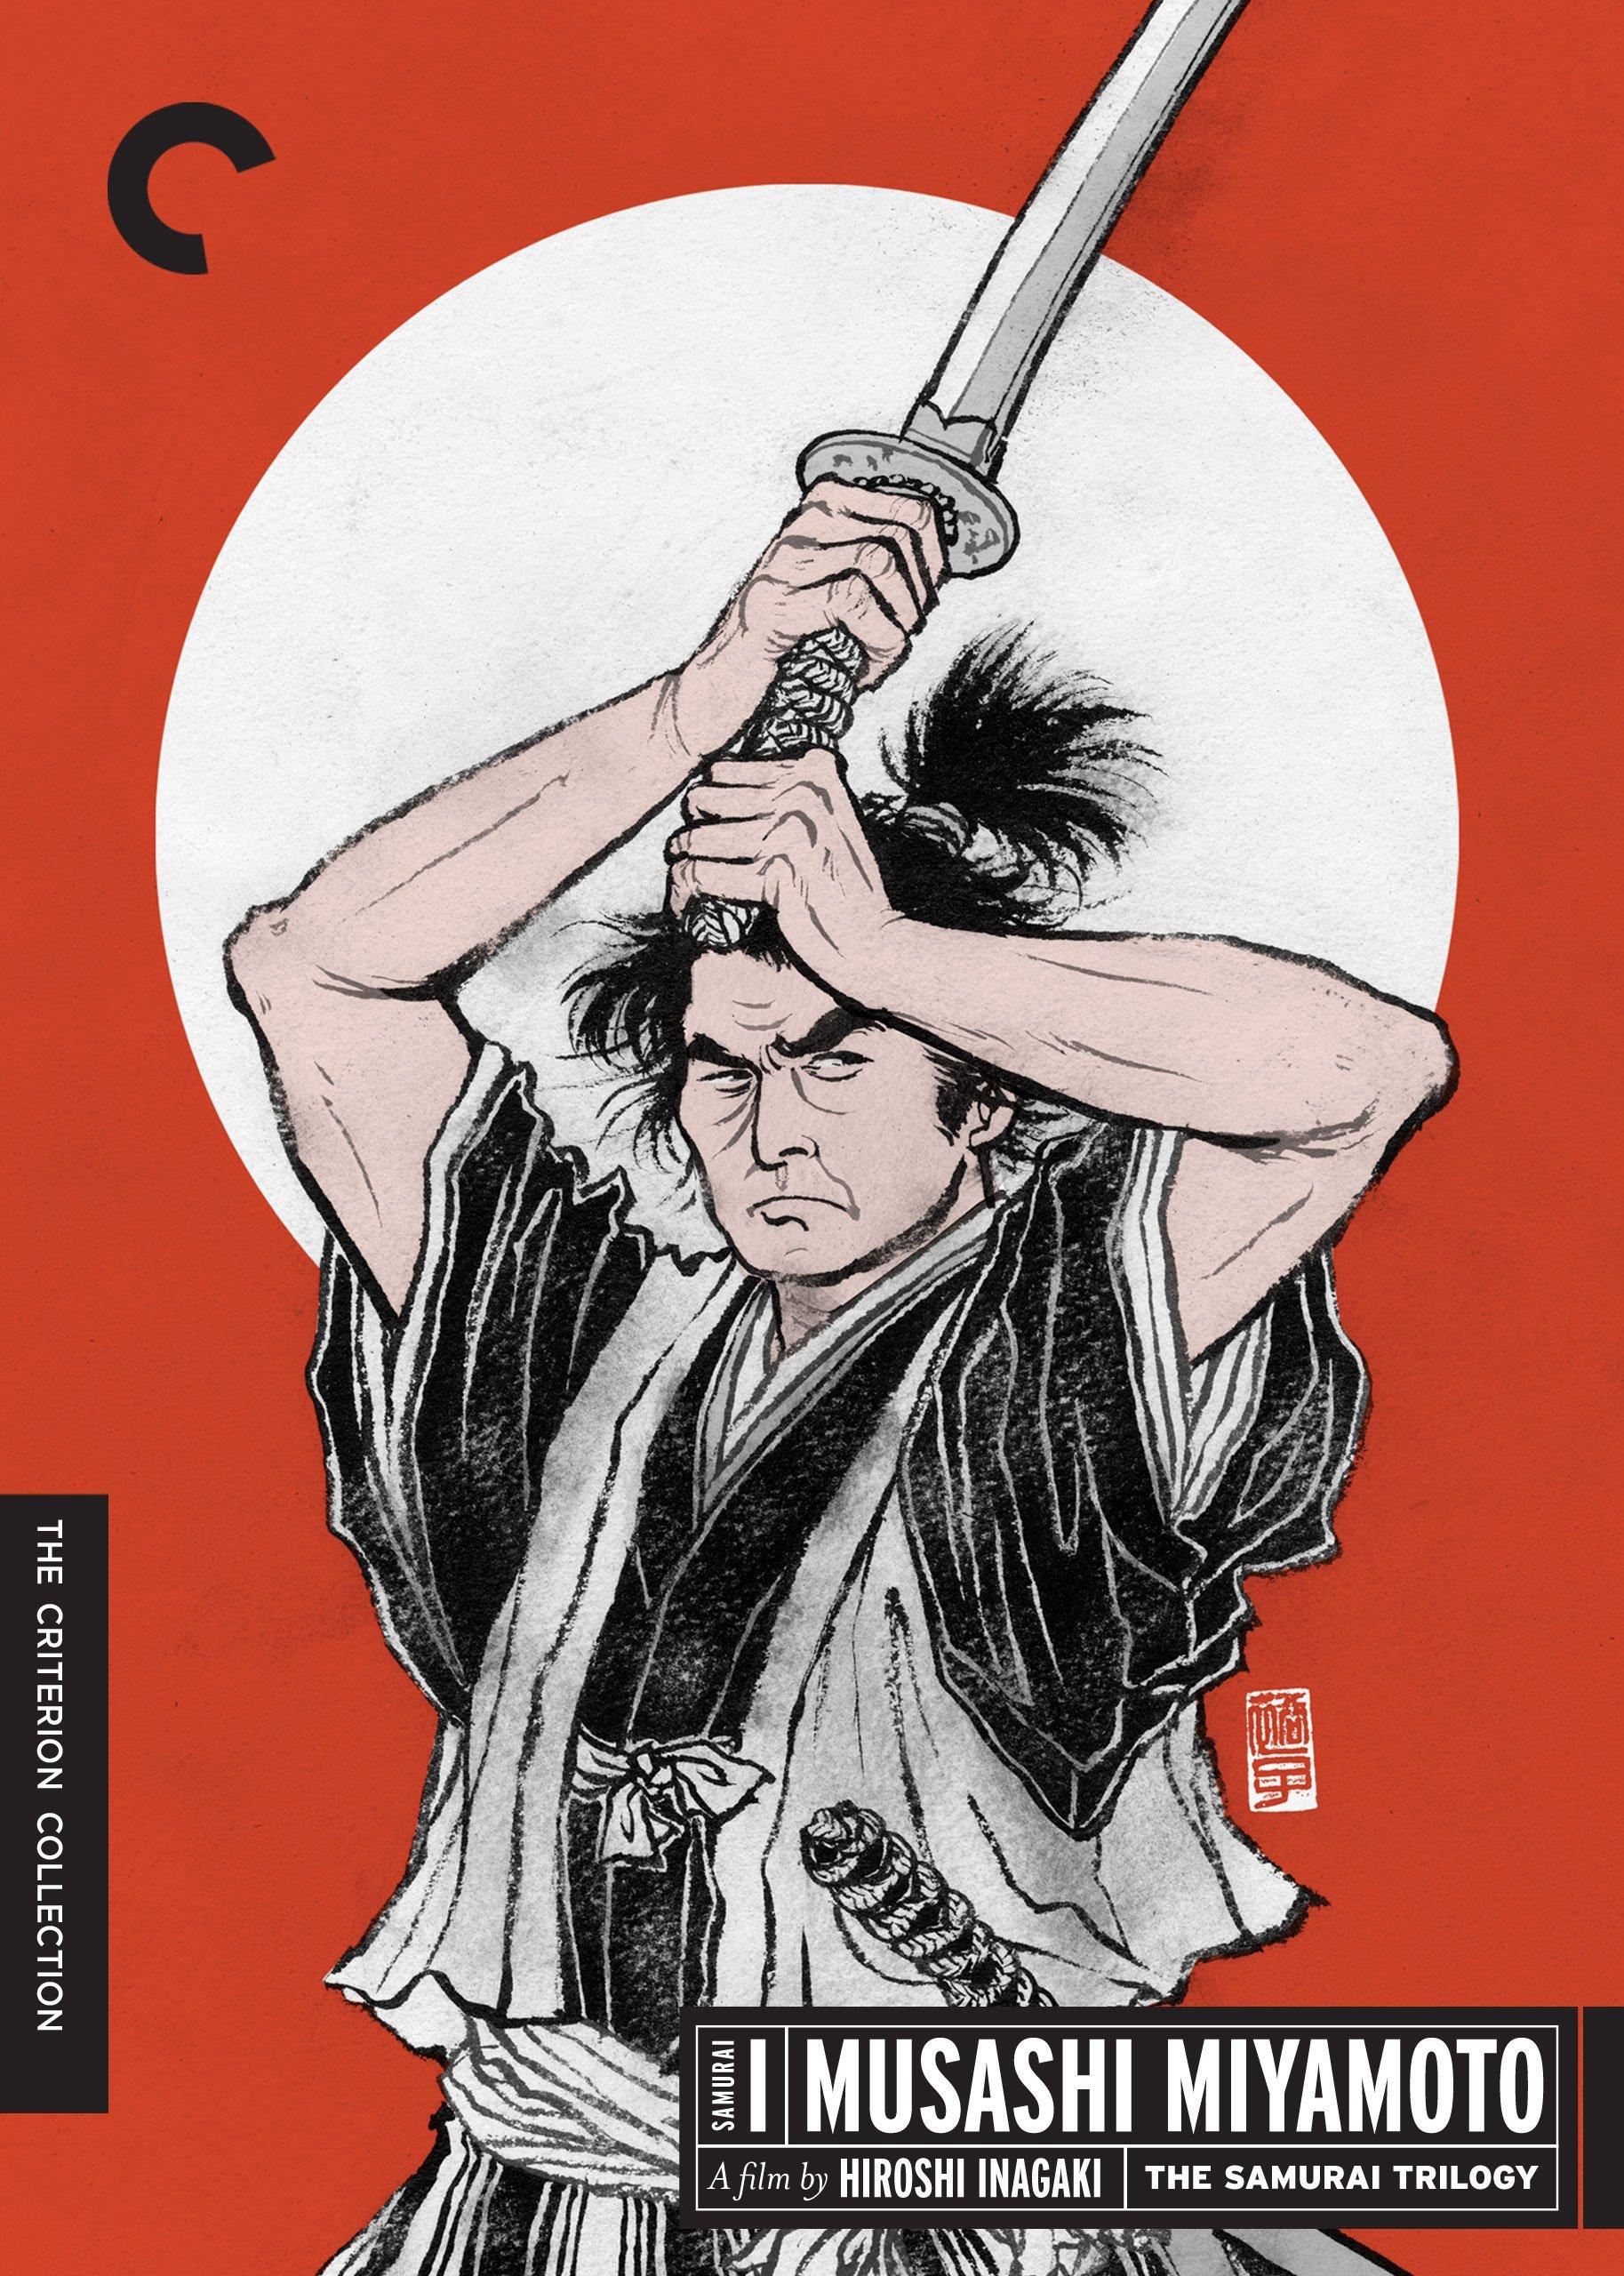 Samurai I: Musashi Miyamoto (1954) - Directed by: Hiroshi InagakiStarring: Toshirô Mifune, Mariko Okada, Rentarô MikuniRated: NRRunning Time: 1h 33mTMM Score: 3.5 out of 5STRENGTHS: Characters, Story, Themes, Color, JapanWEAKNESSES: Action, Blocking